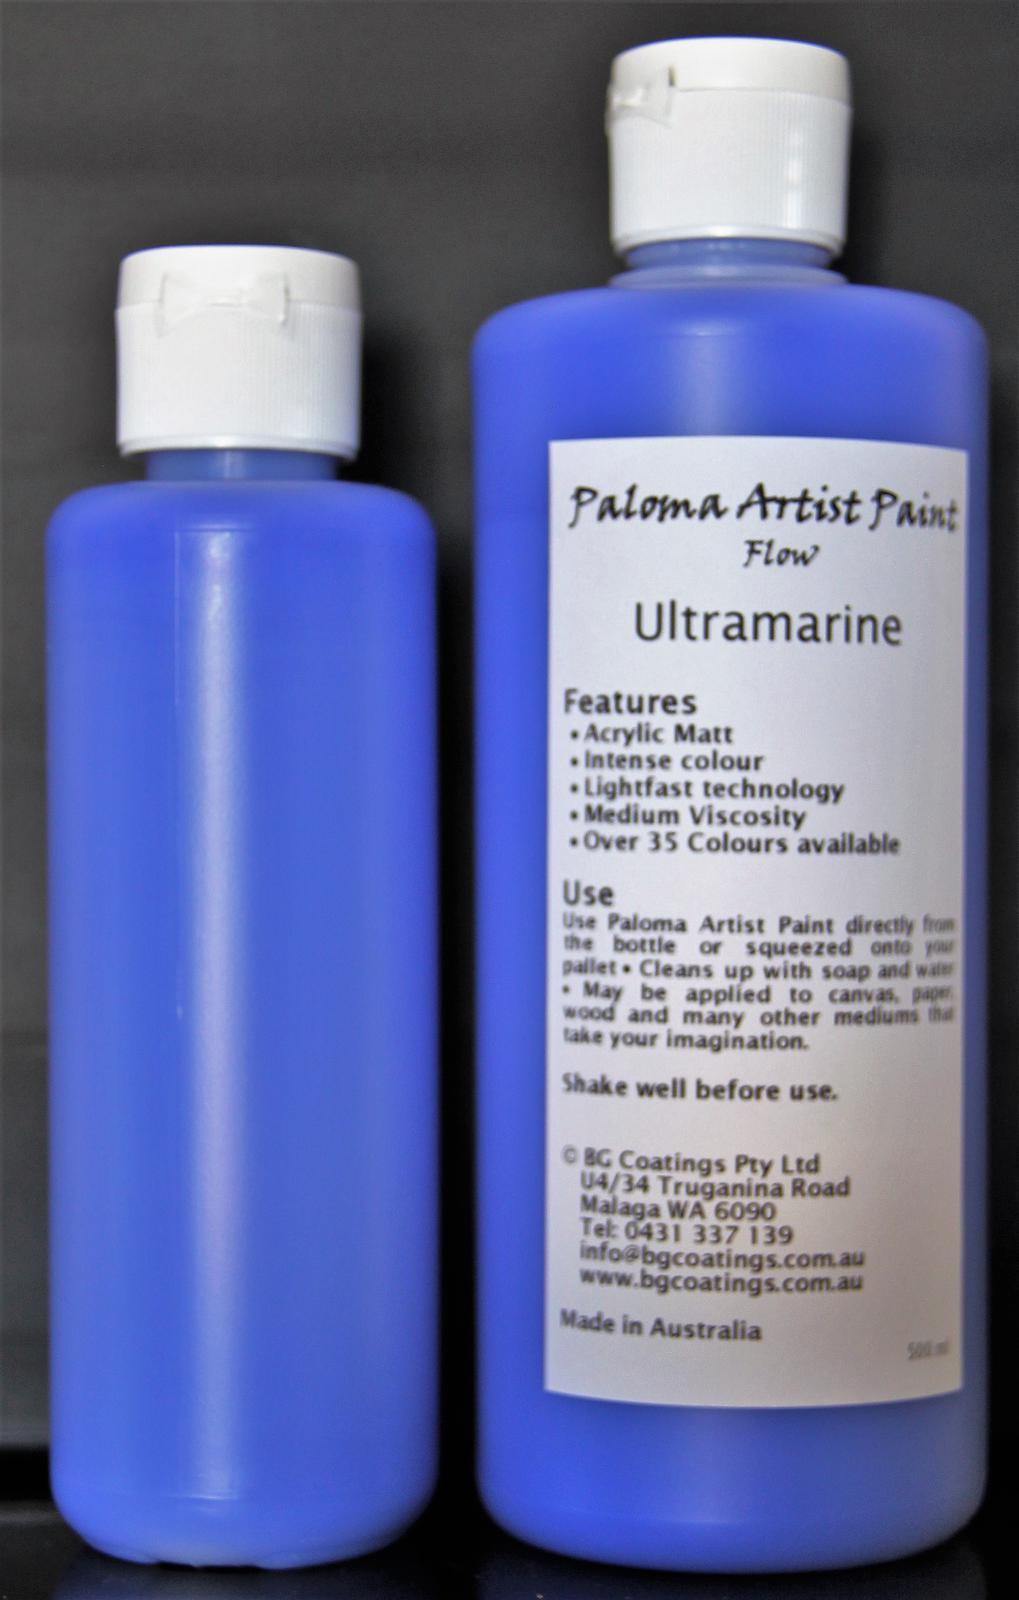 Paloma Artist Paint-Ultramarine